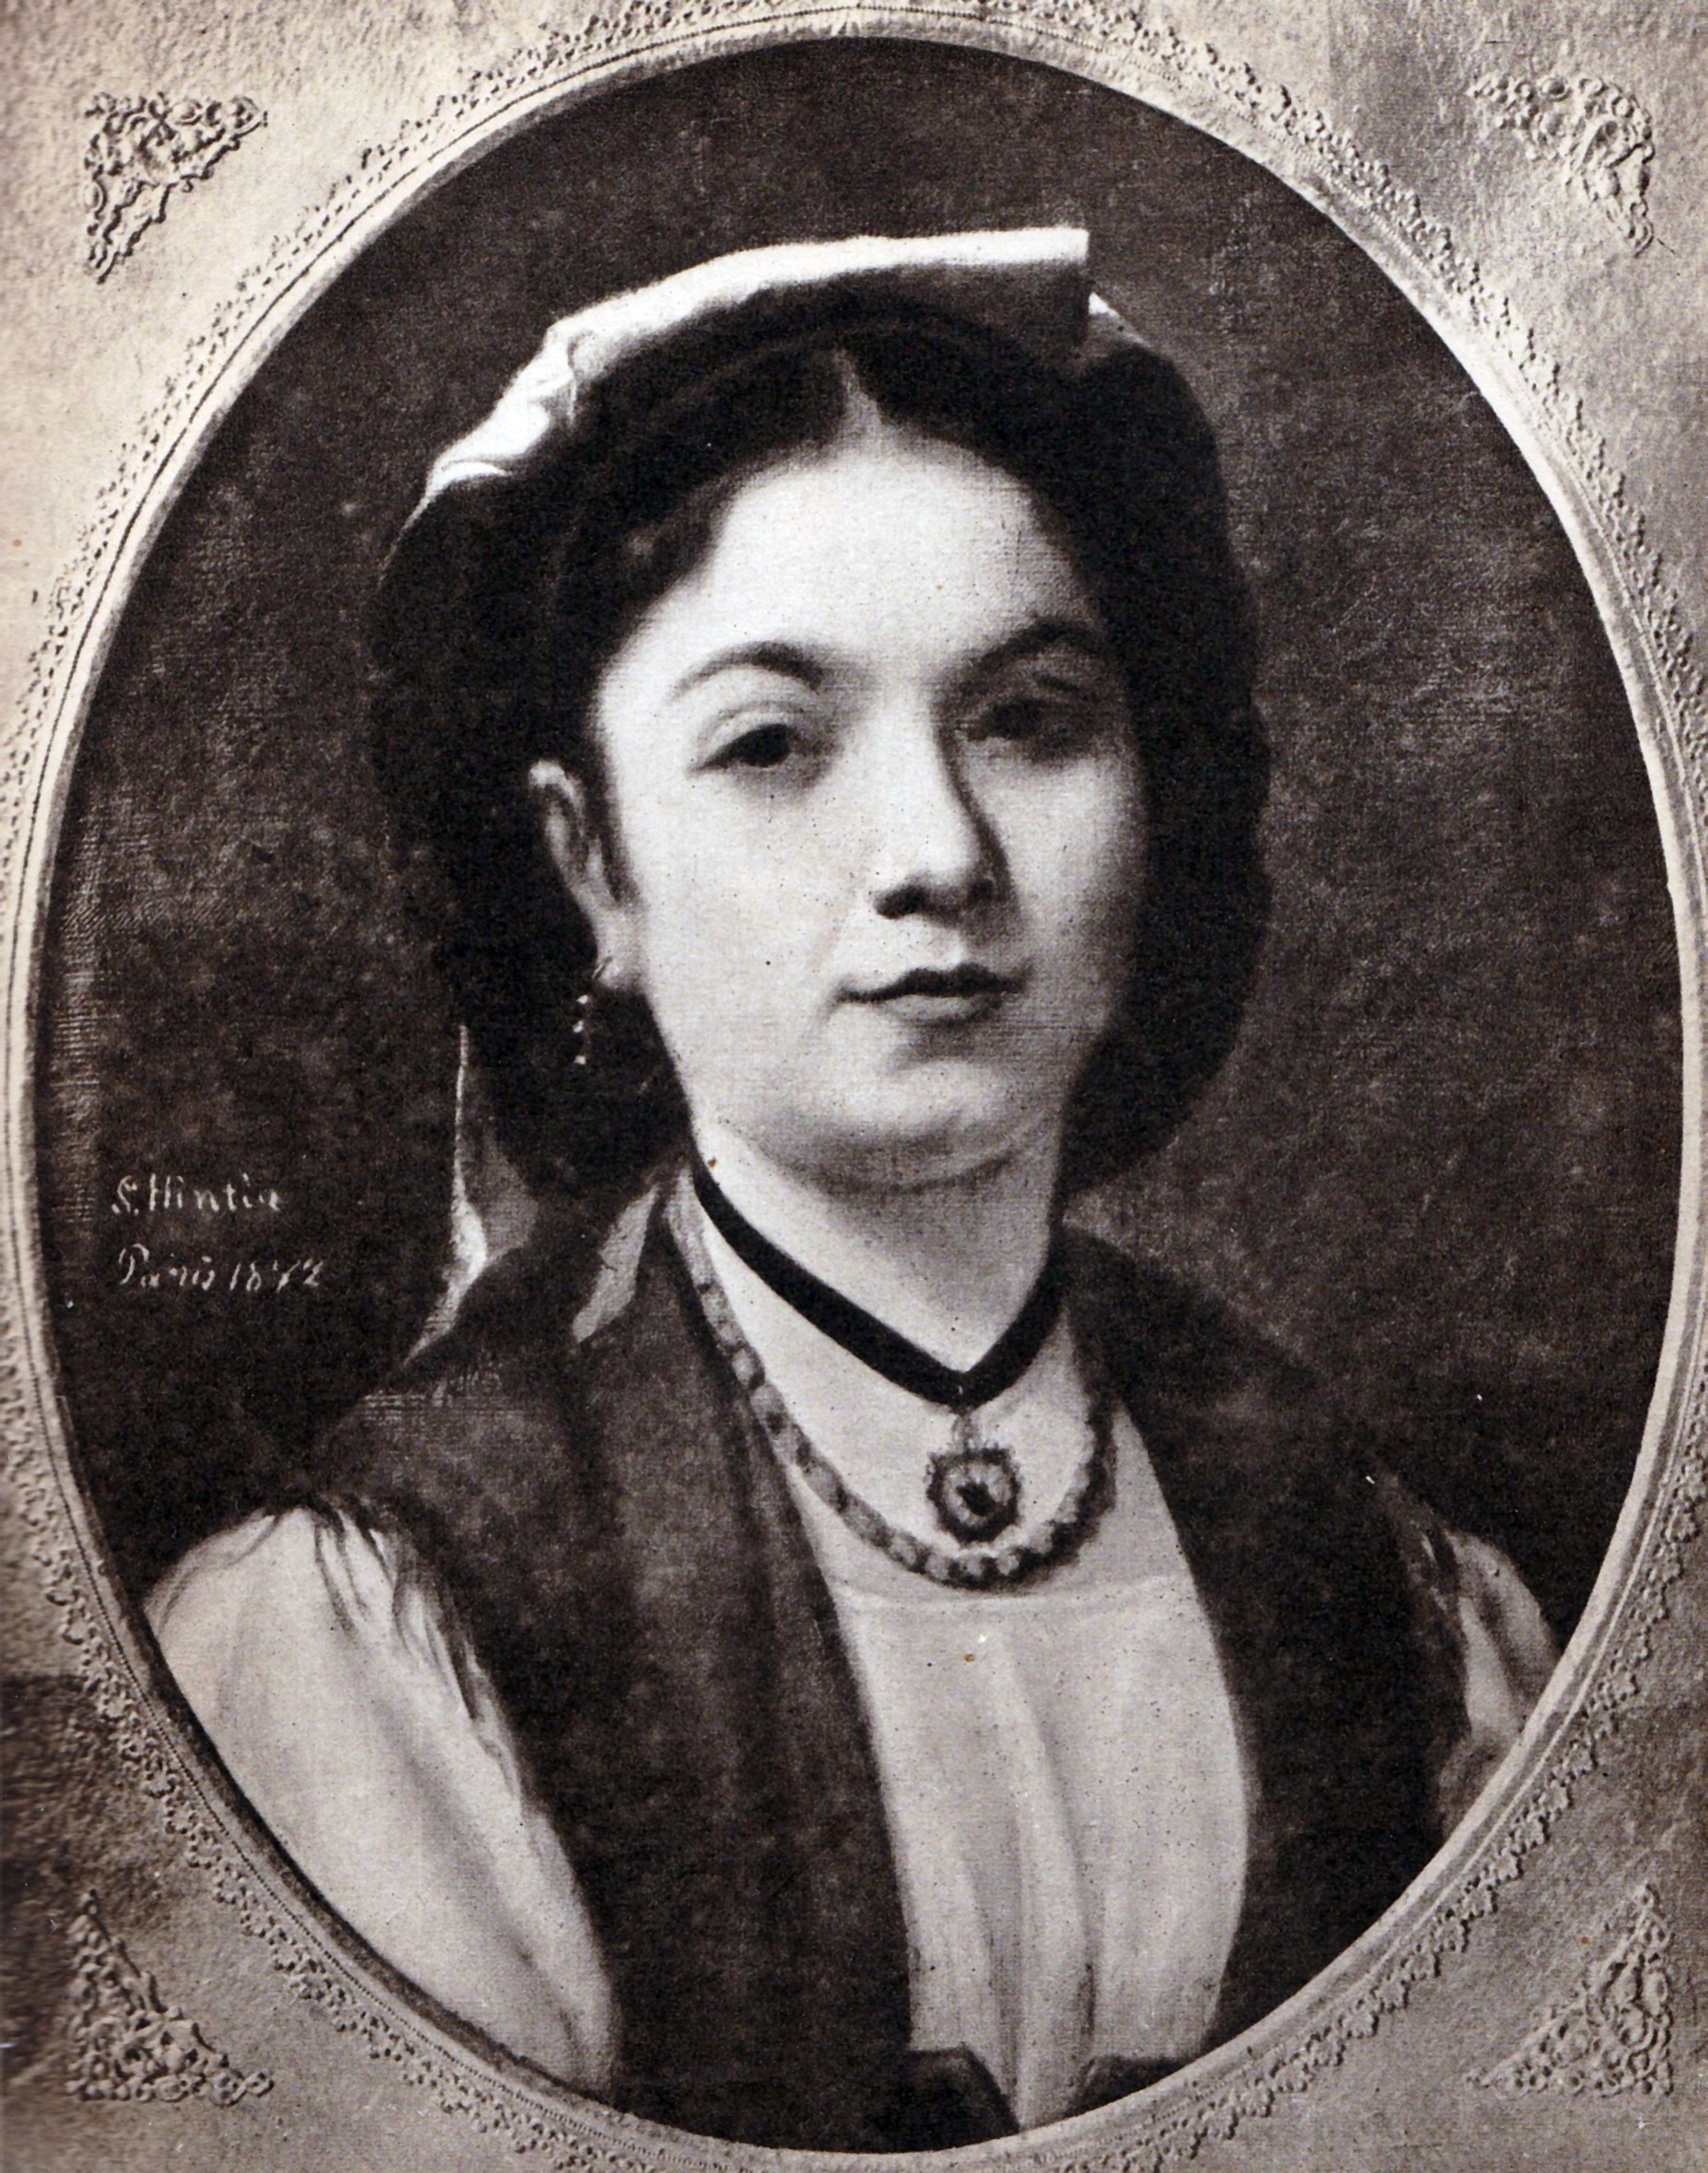 Hentia Pics for file:sava hentia - italianca - wikimedia commons